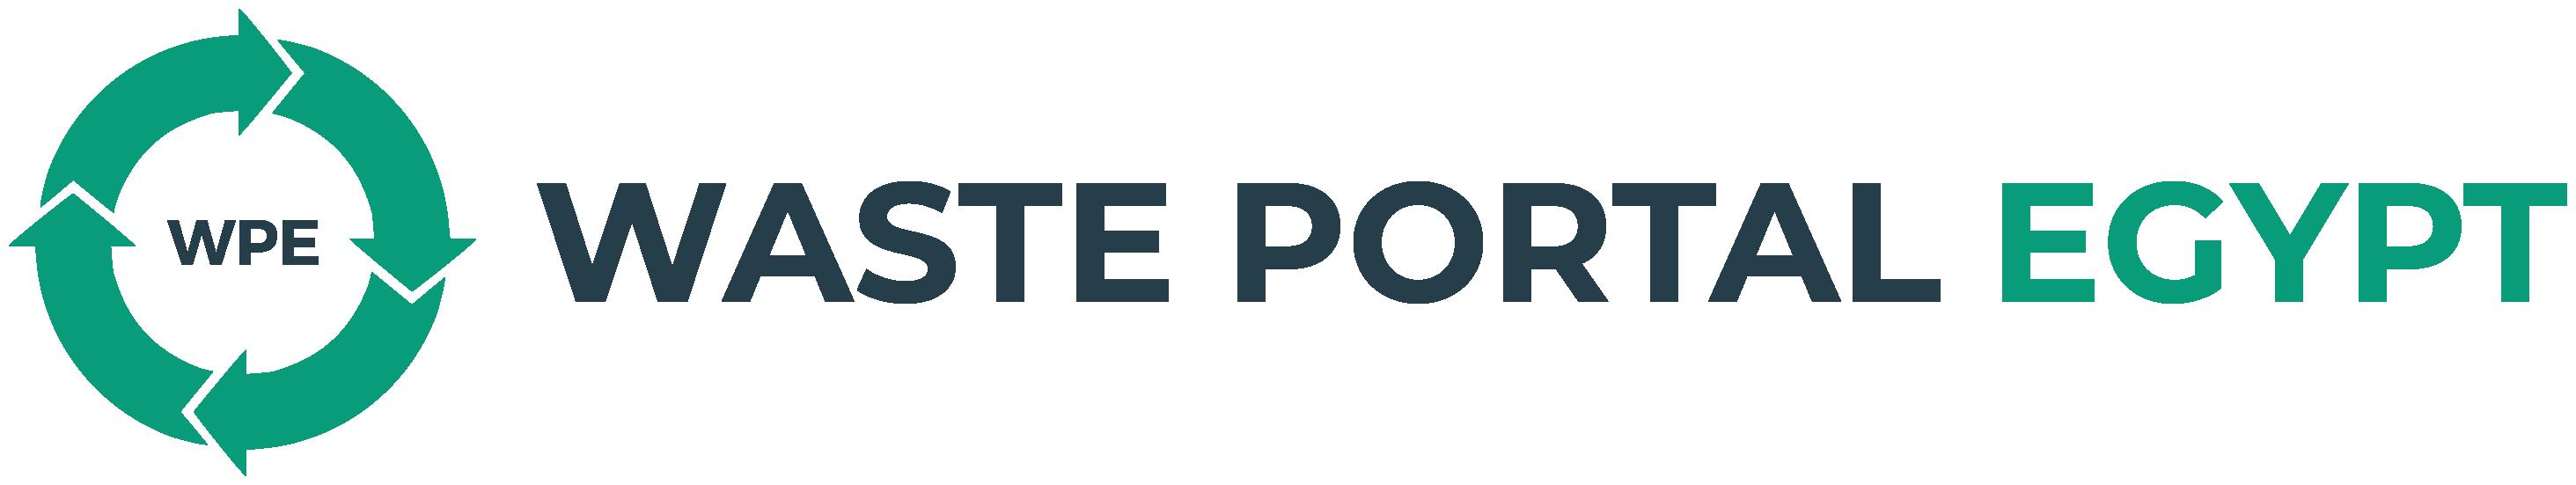 Waste Portal Egypt